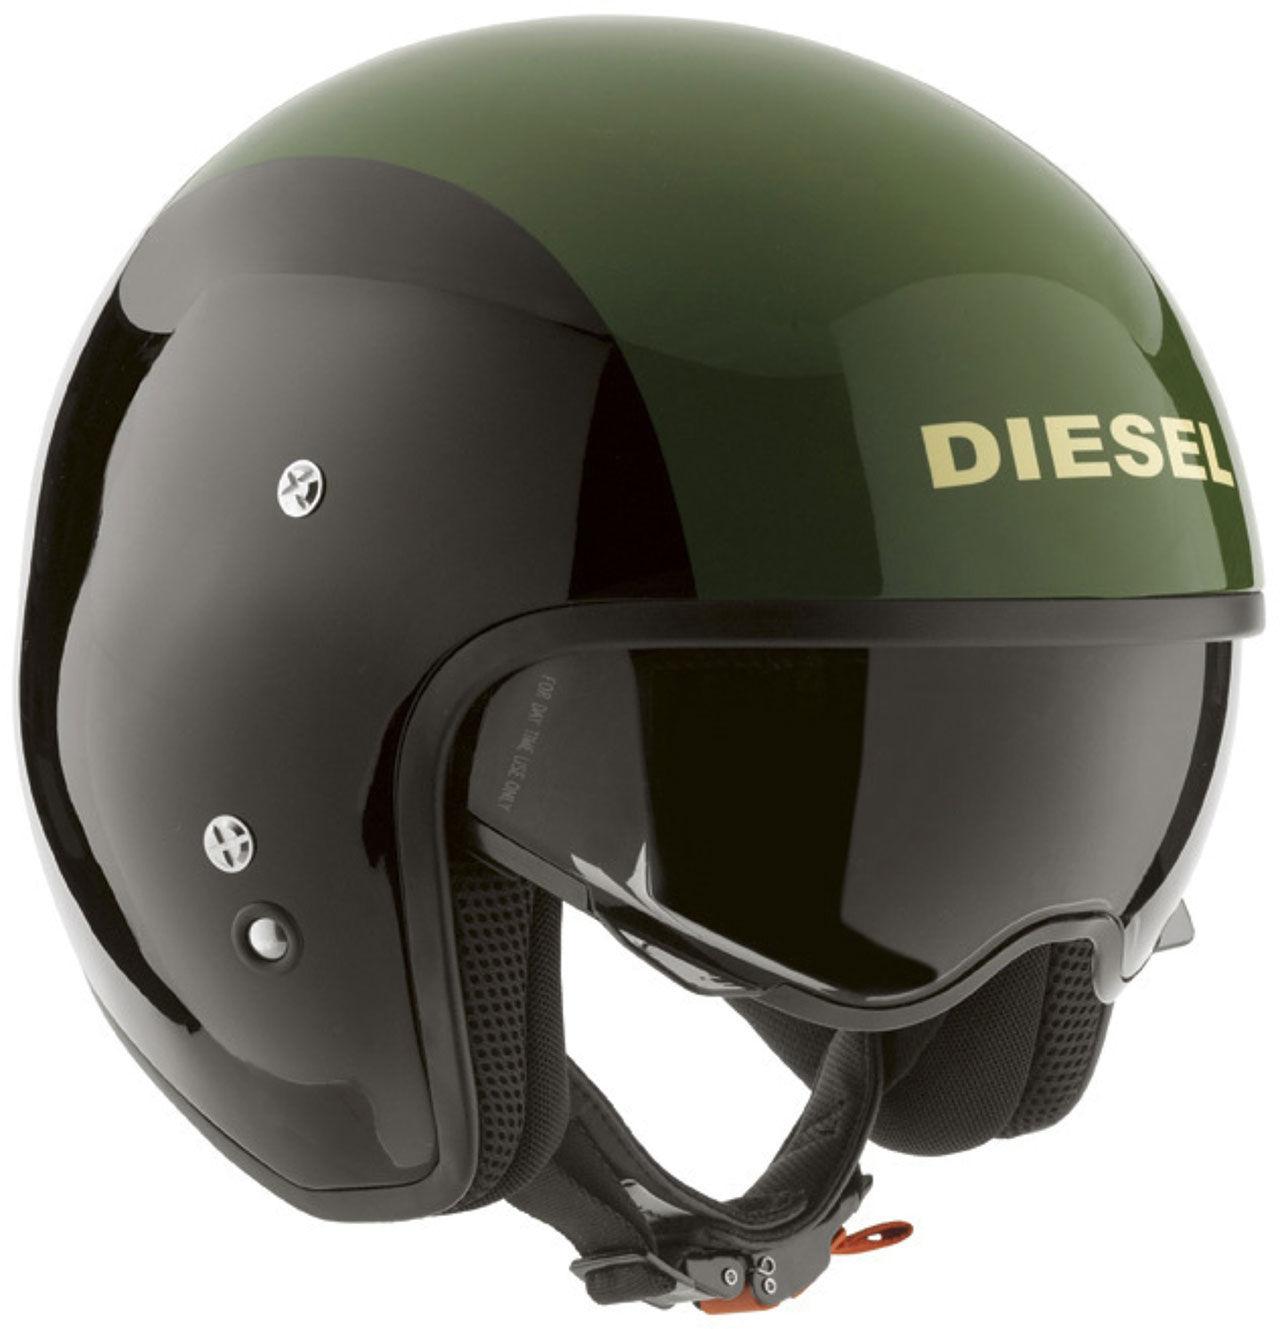 Diesel lanserar mc-hjälmar